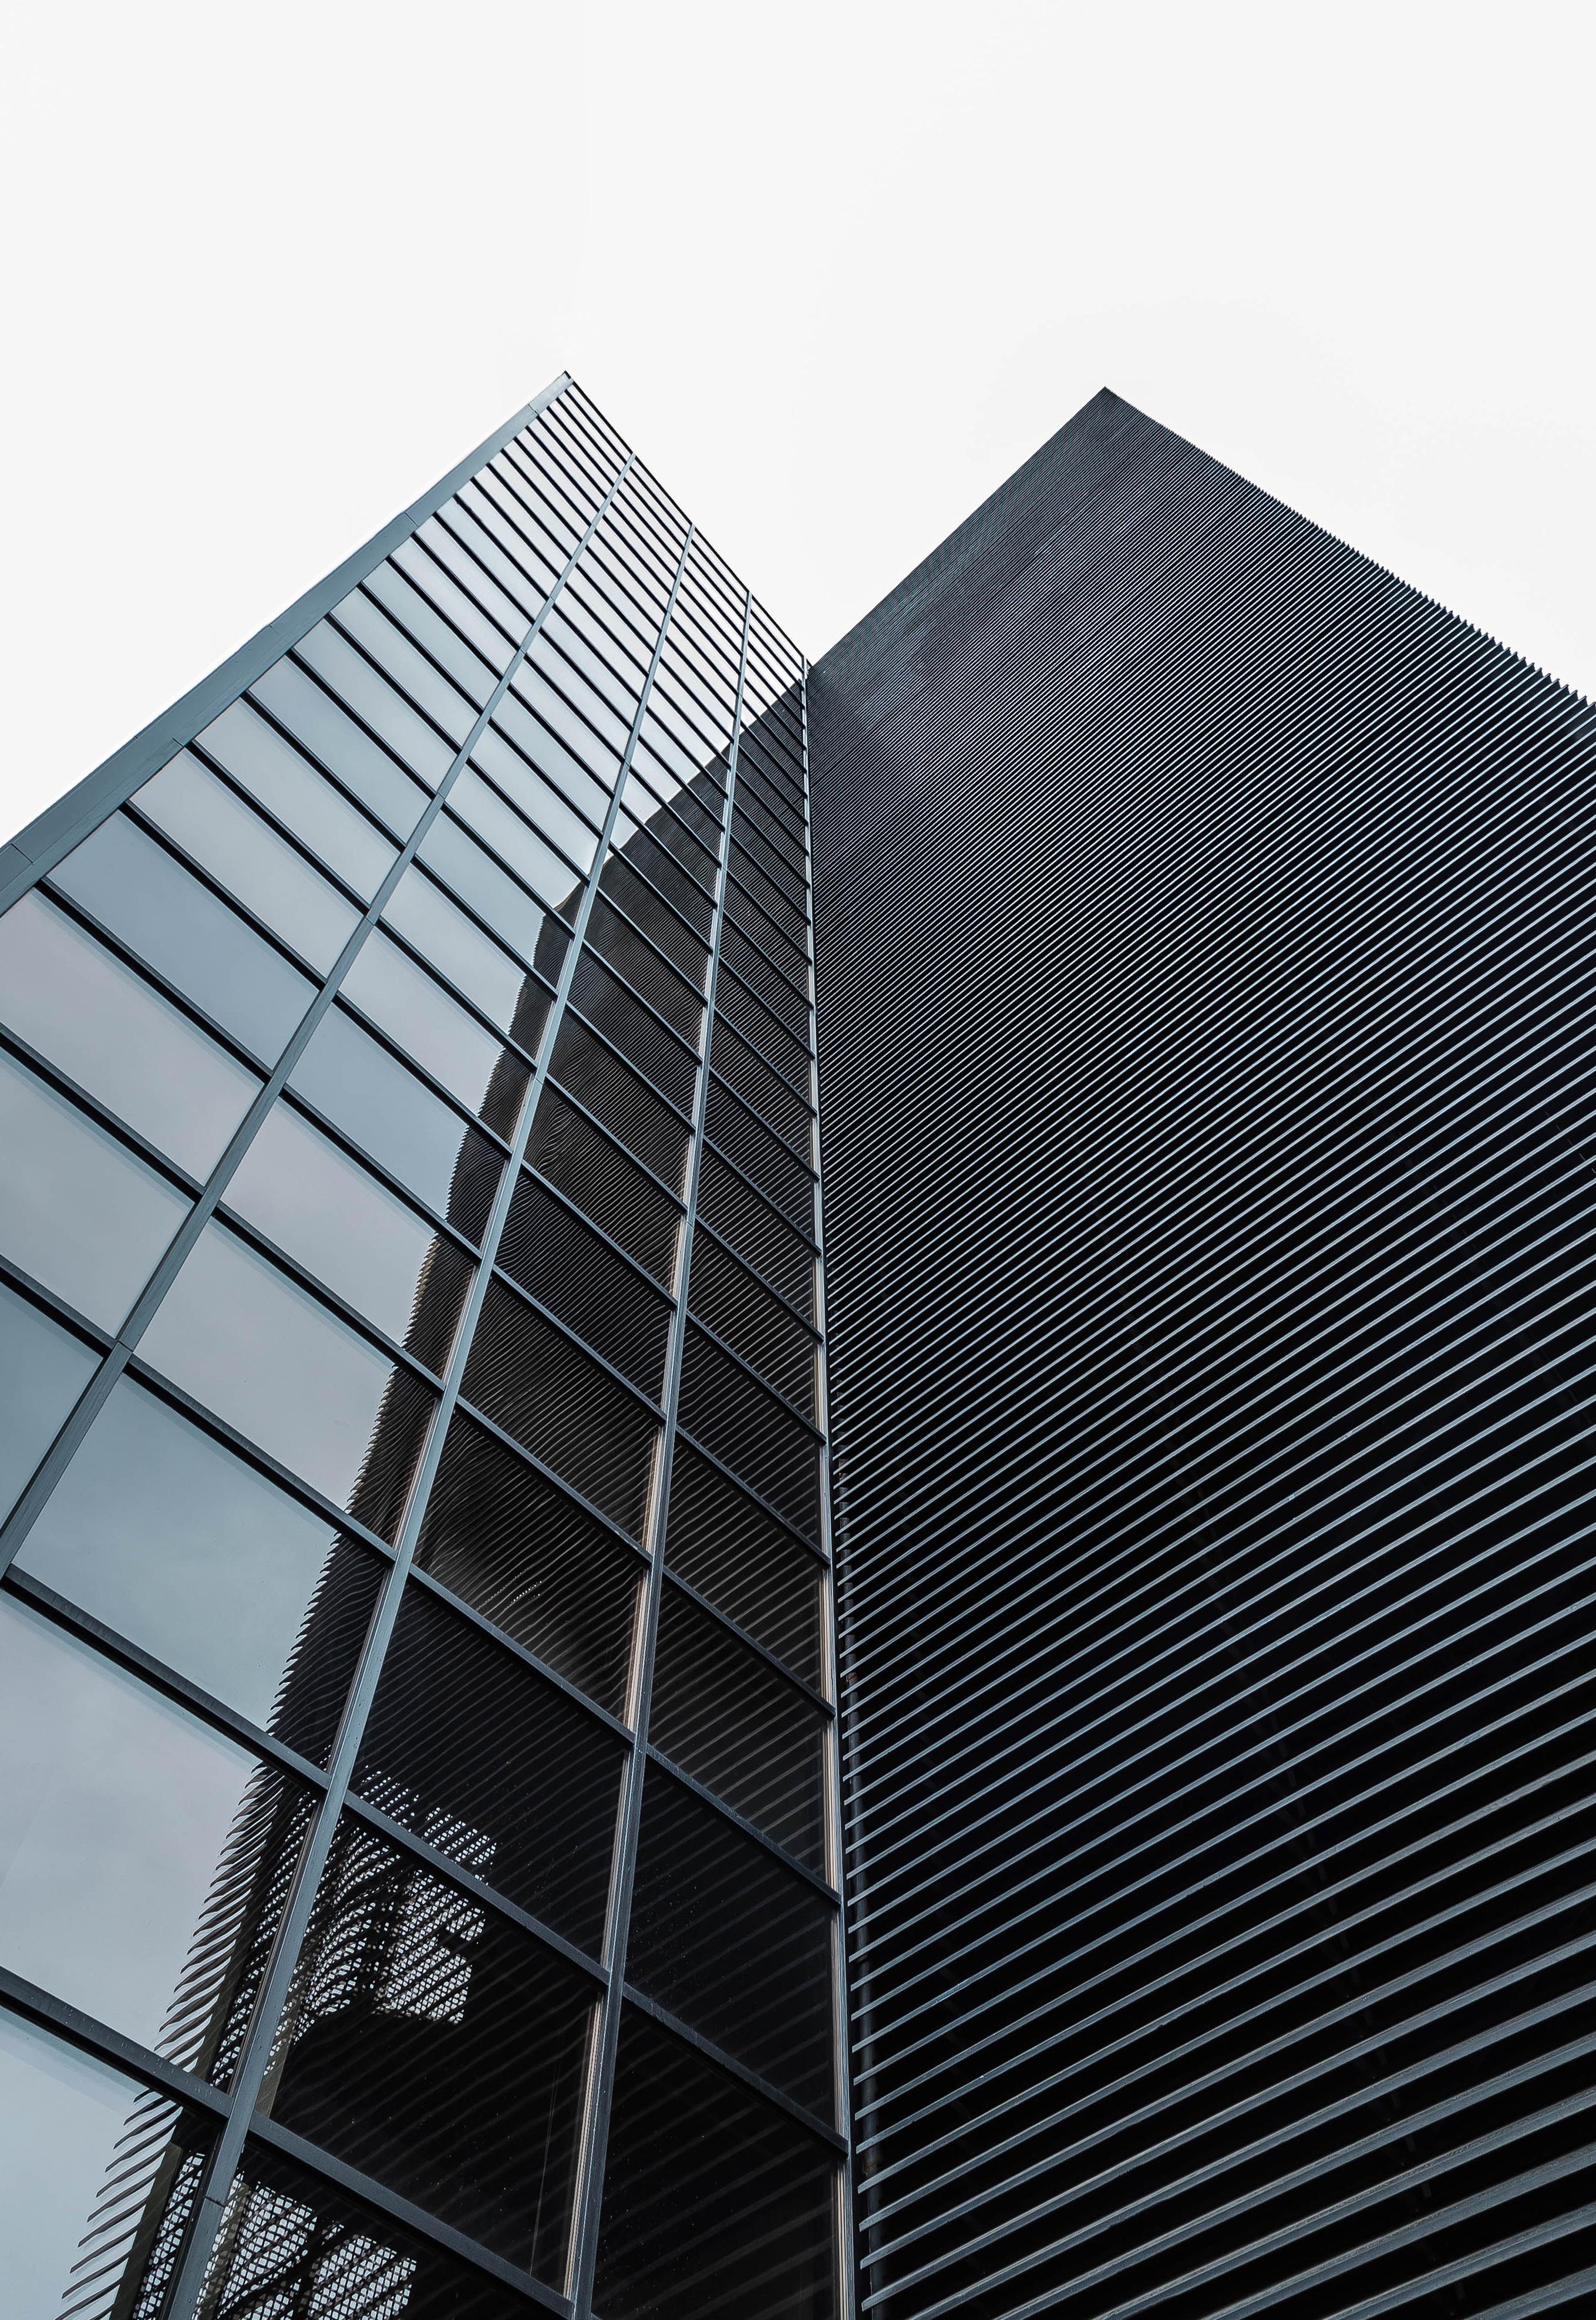 Fotos gratis arquitectura techo edificio rascacielos for Arquitectura en linea gratis